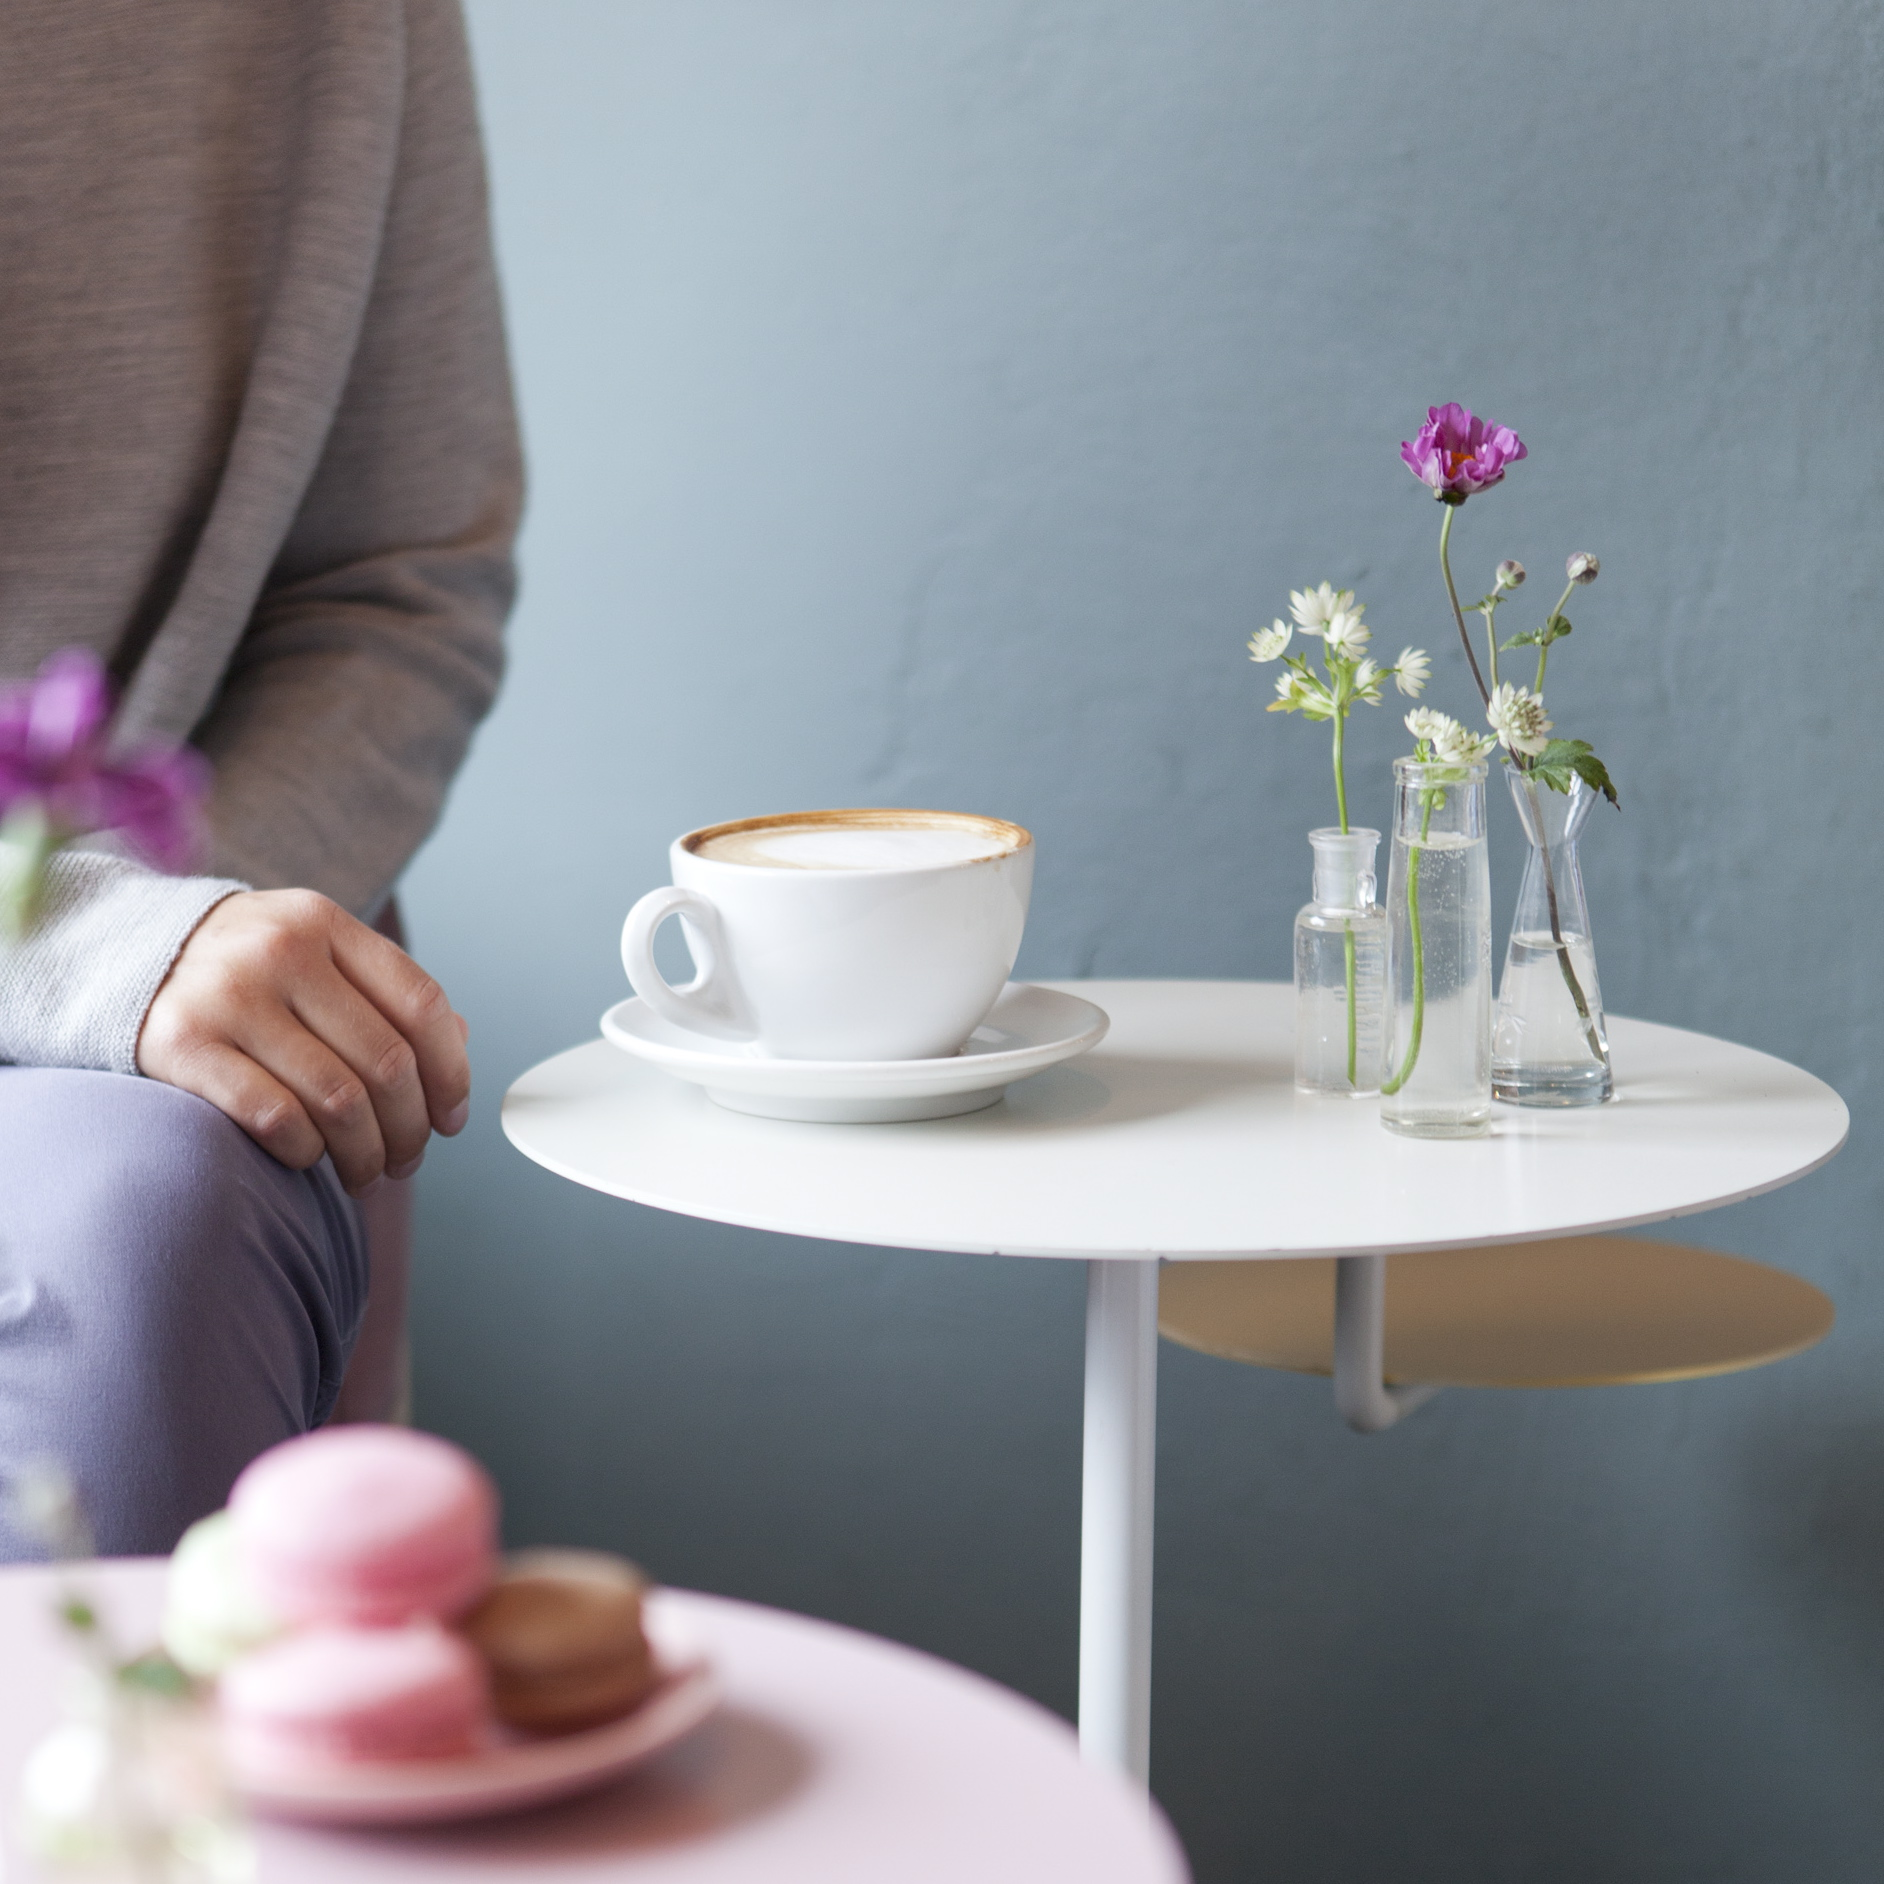 Suesskramdealer-Berlin-Cafe-Friedenau-3